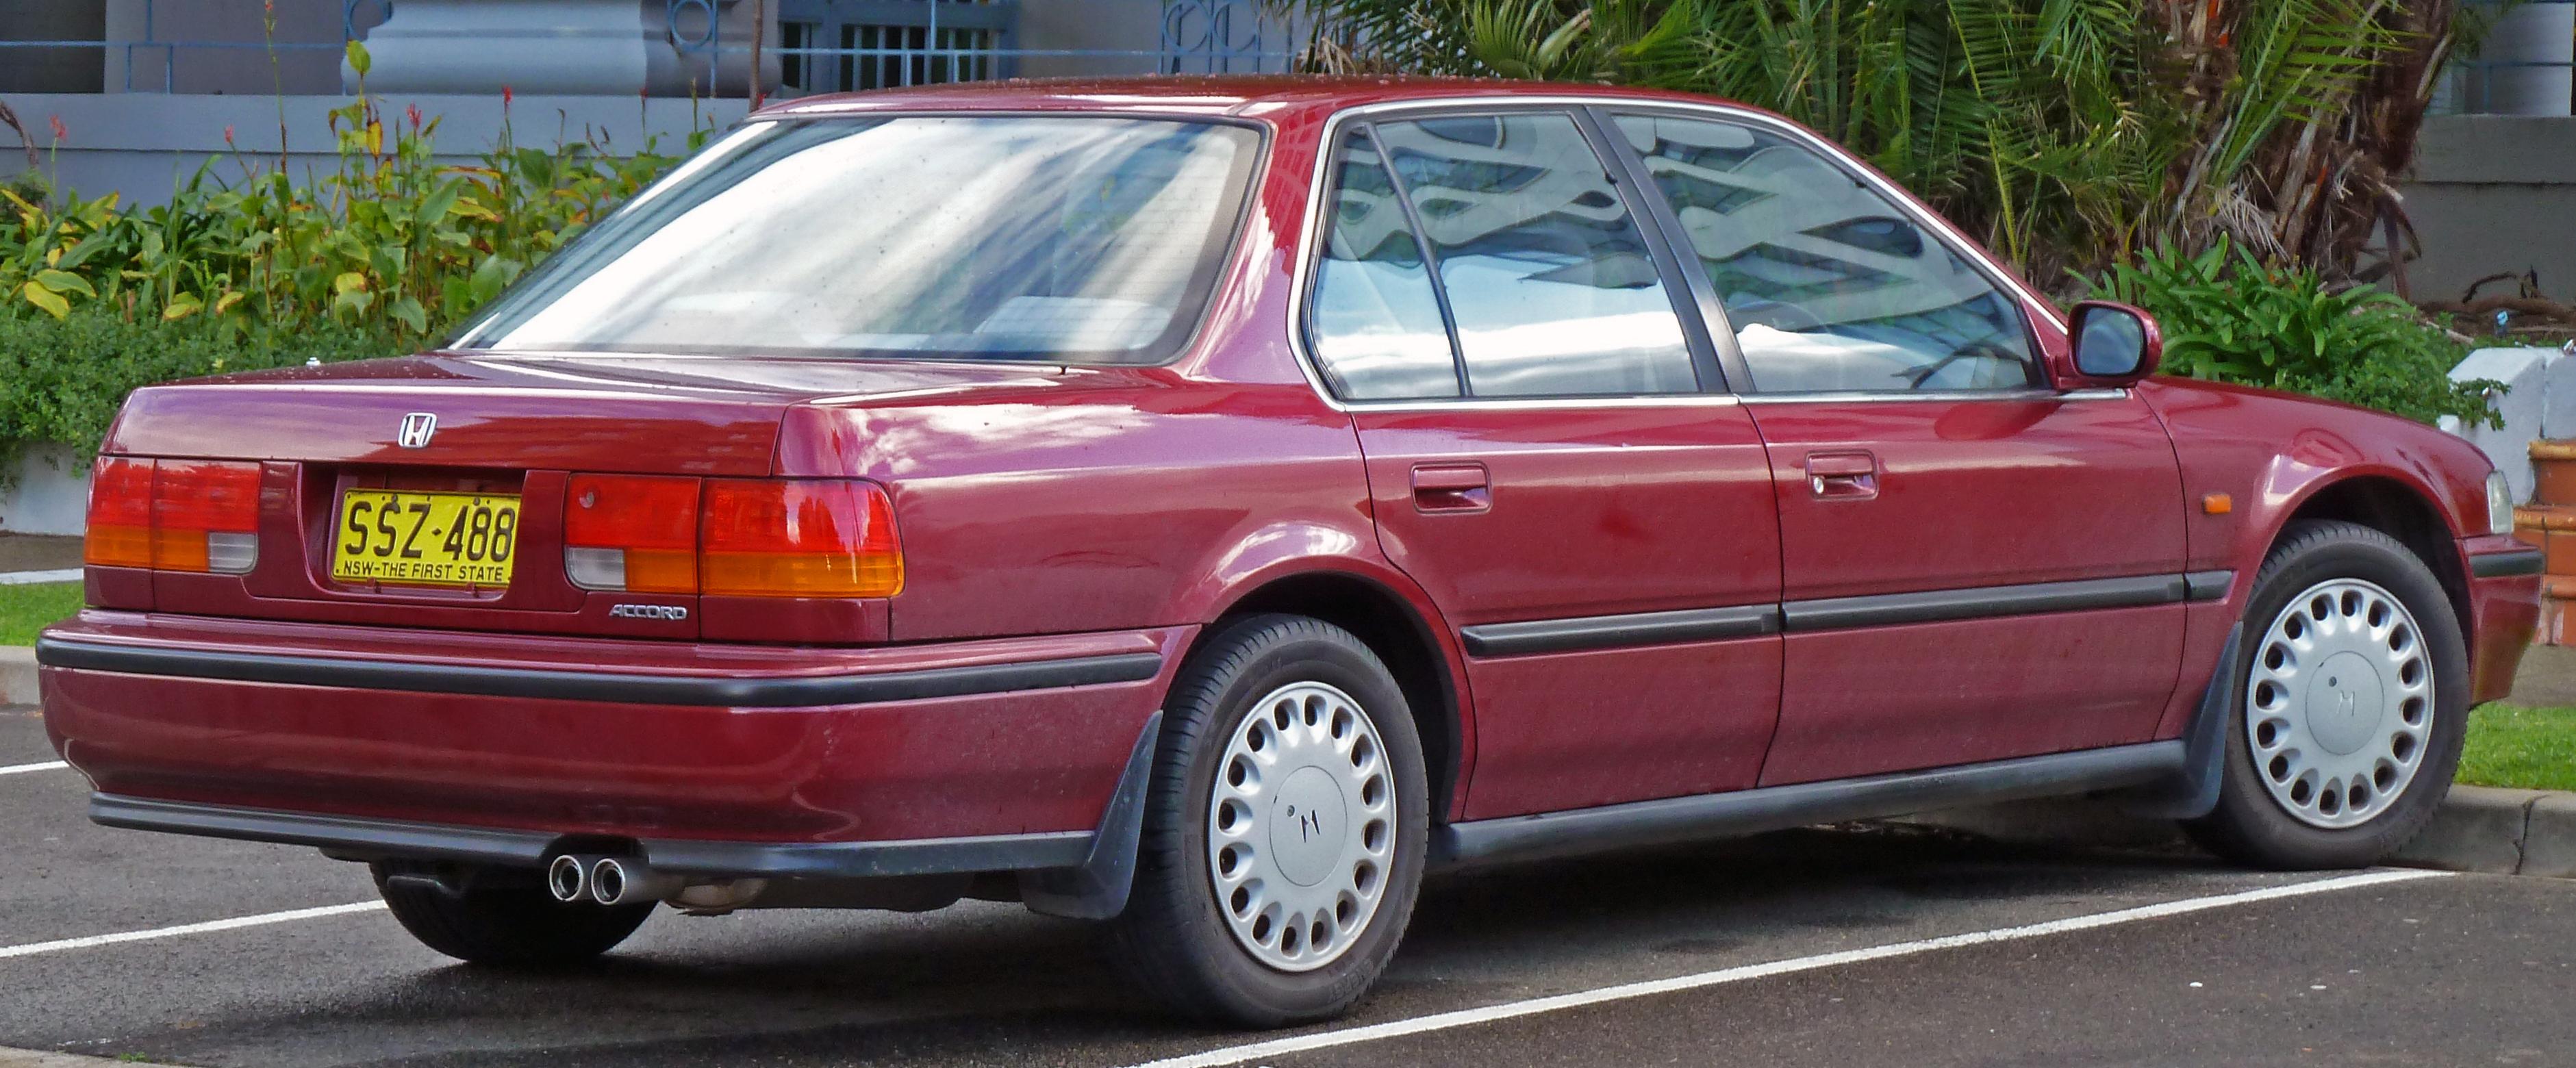 1991 Honda Accord #9 Honda Accord #9